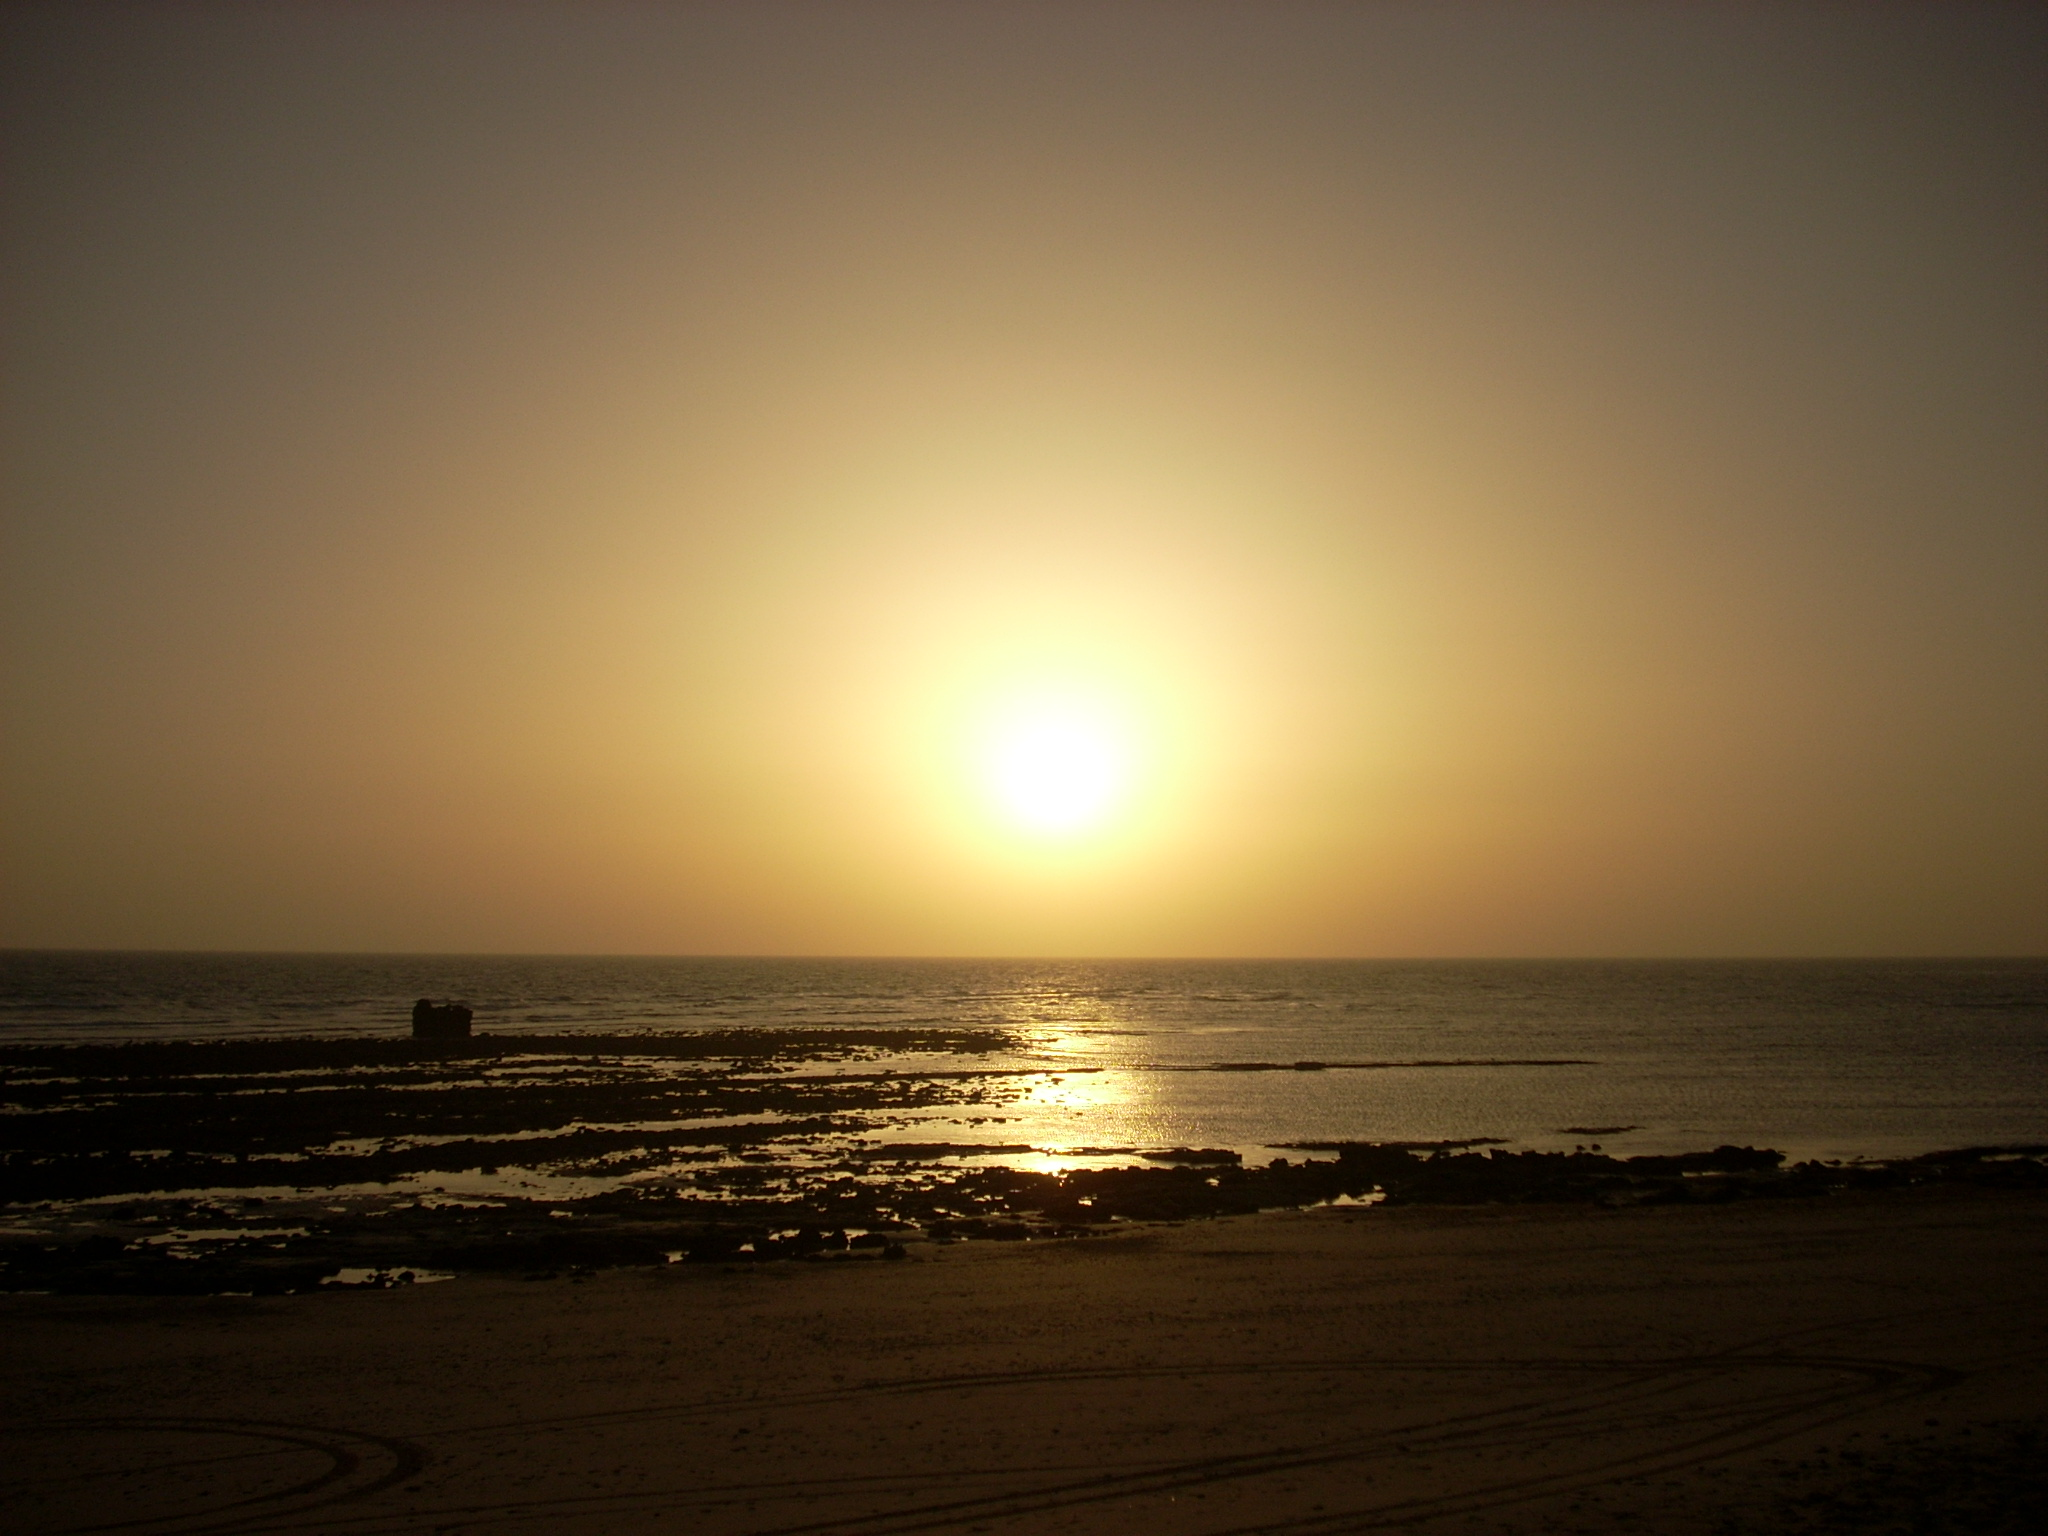 Foto playa Aguadulce / Peginas. Atardece en Aguadulce